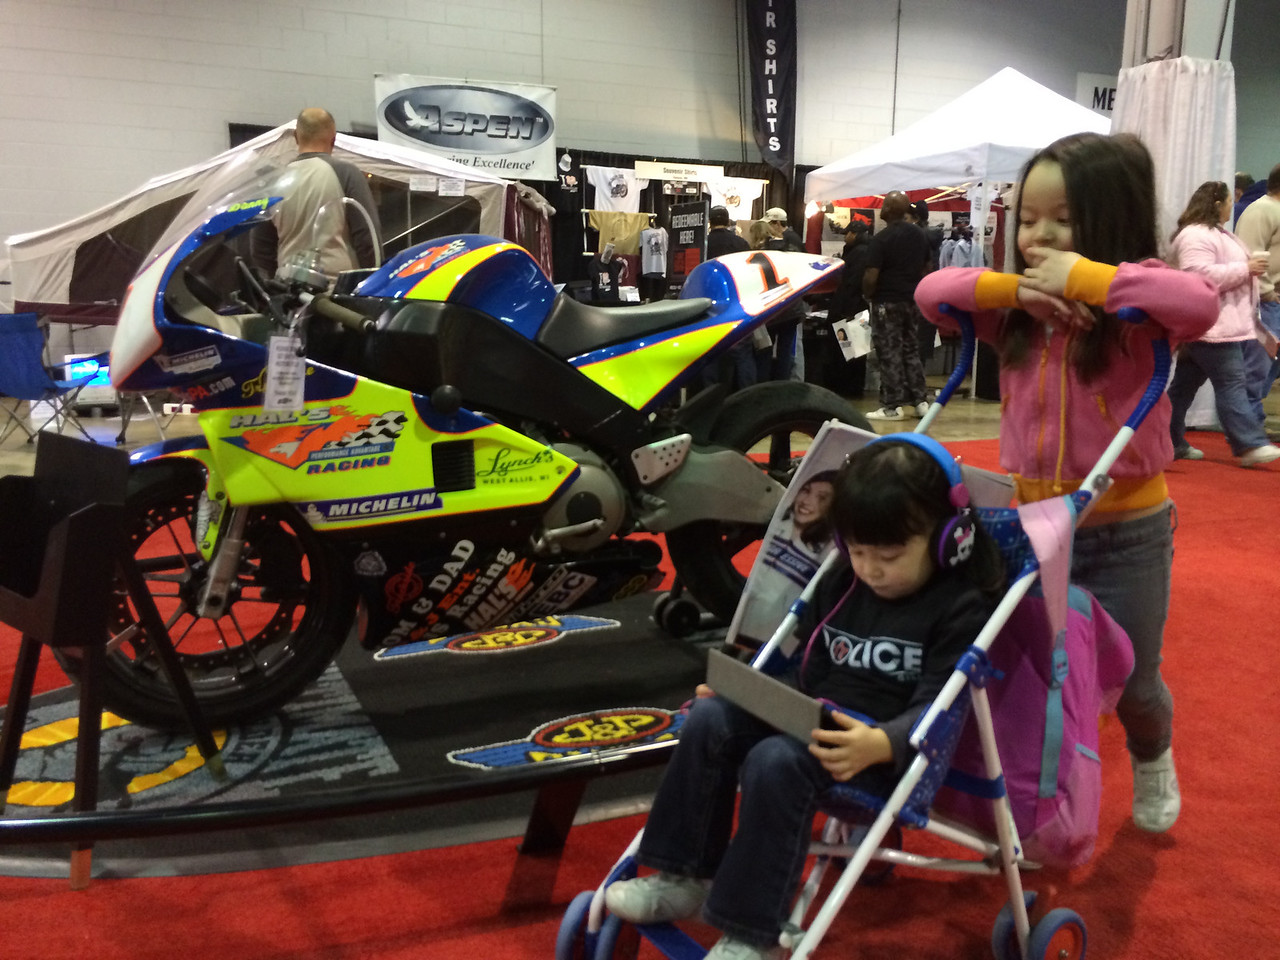 Keira, Chloe and Buell Racing